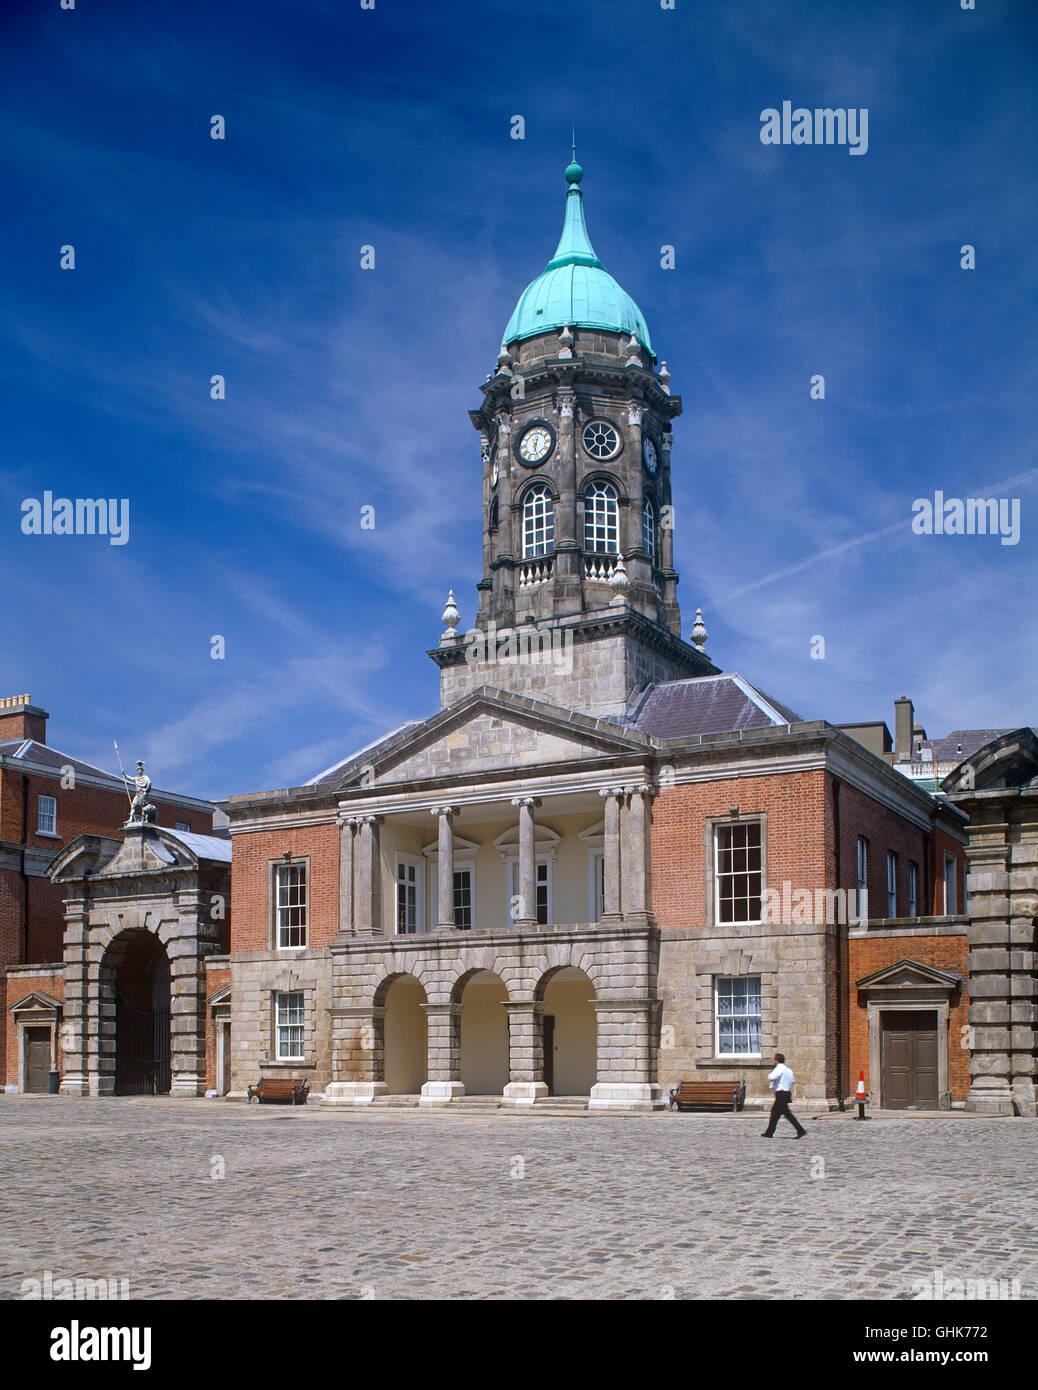 Dublin Castle, County Dublin, Ireland - Stock Image